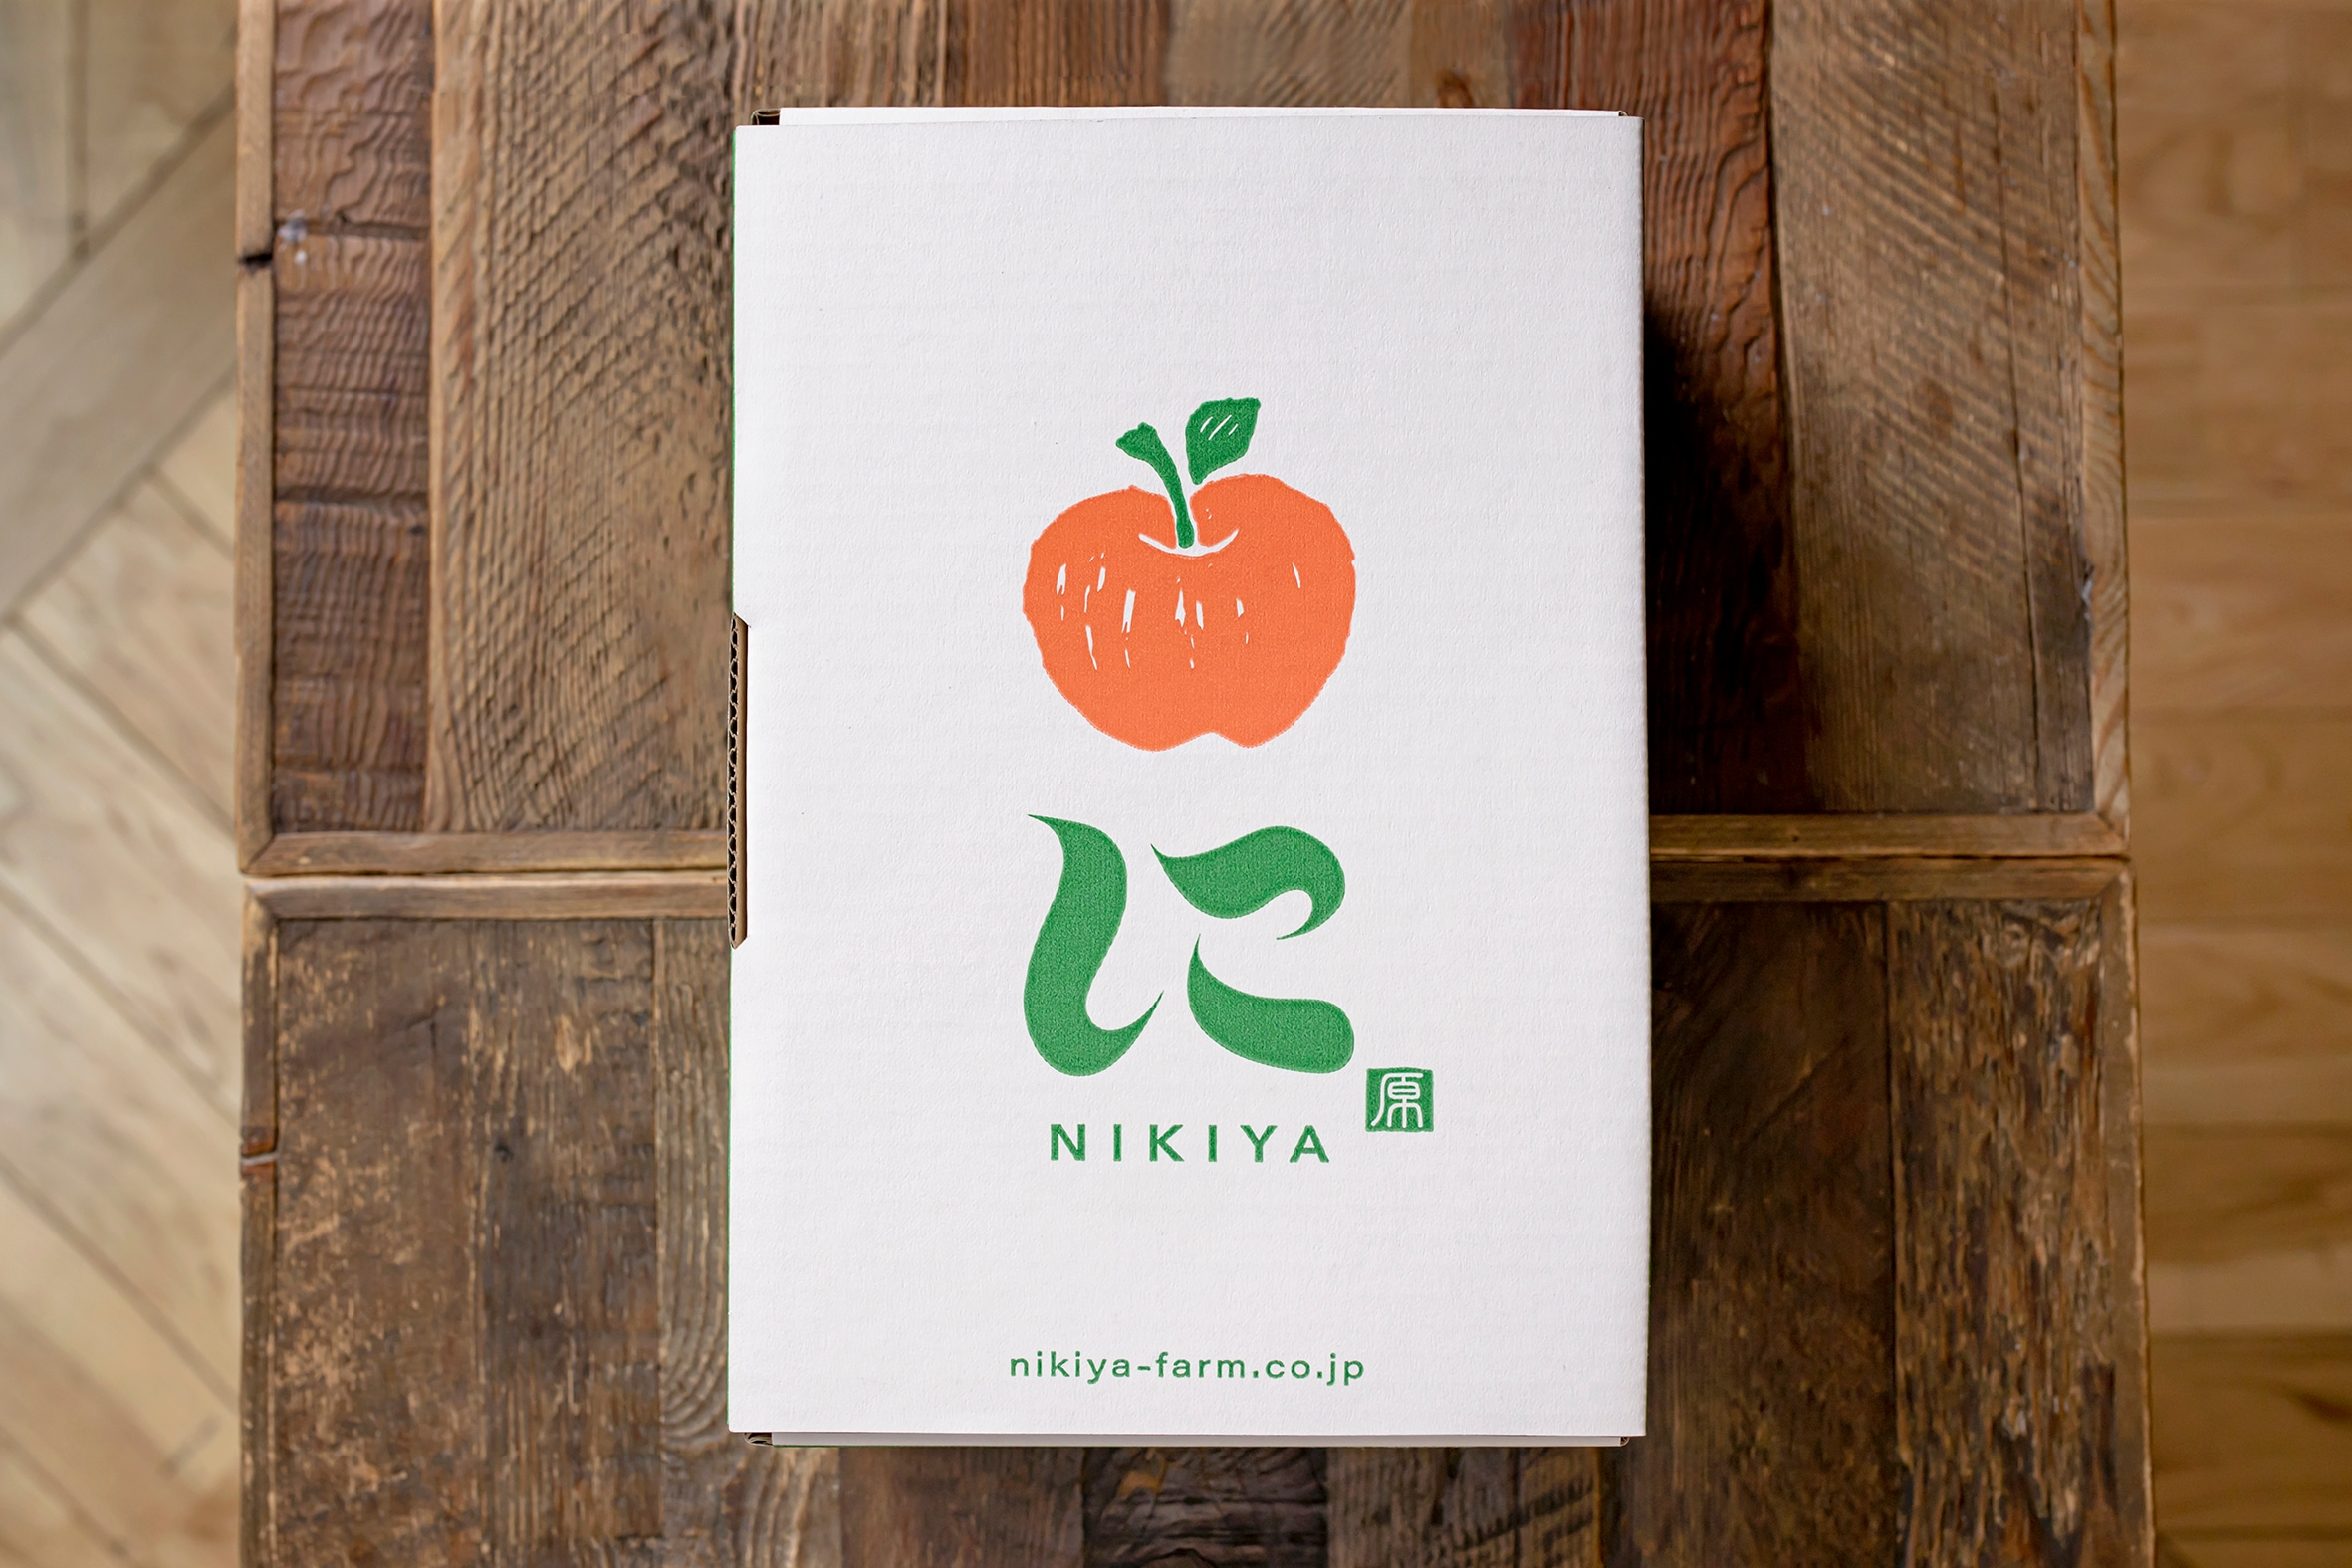 NIKIYA FARM & BREWERY-にきや-のさくらんぼ専用箱,NIKIYA FARM & BREWERY -にきや-のオリジナルパッケージ